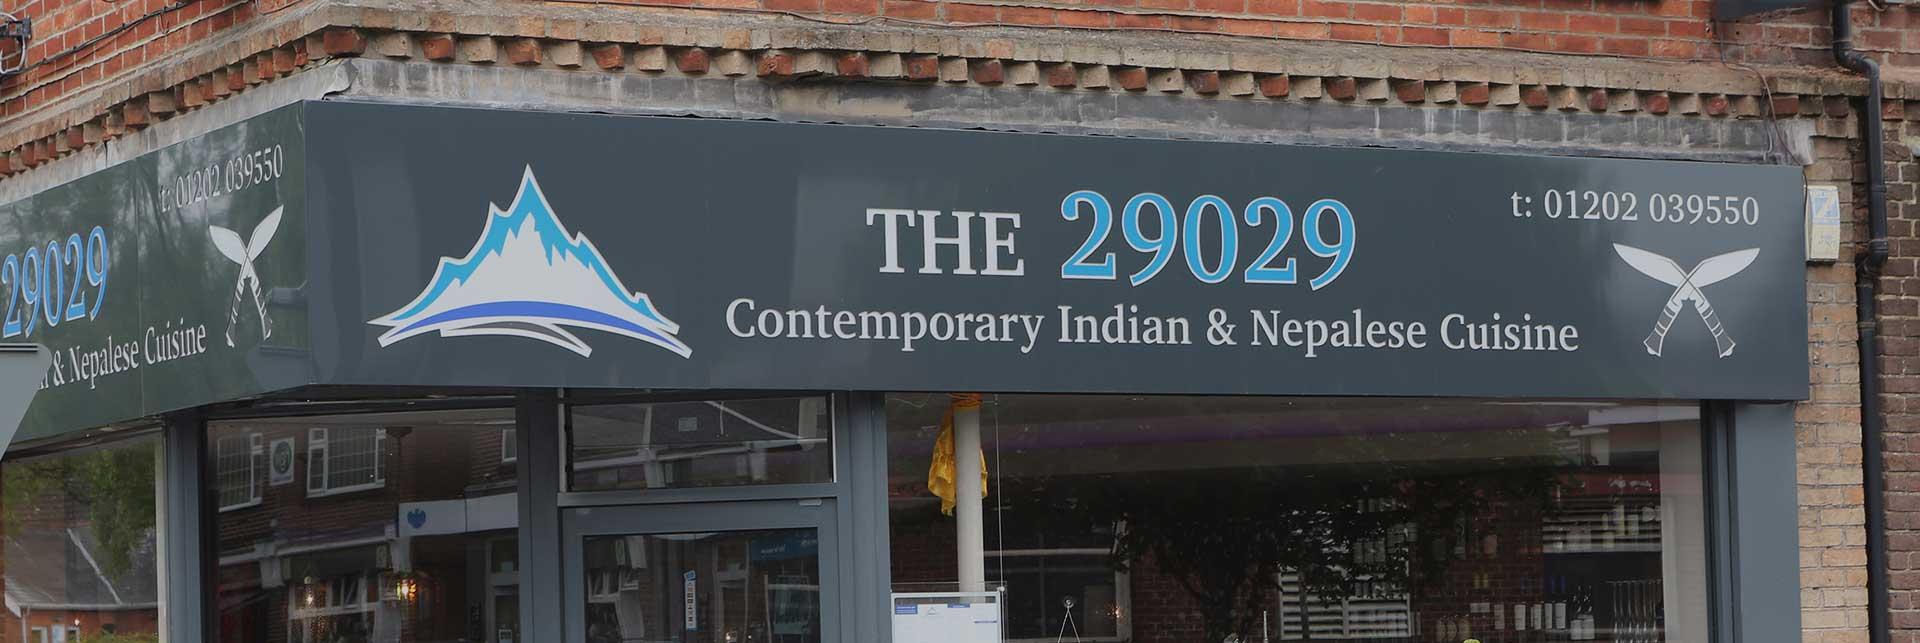 Exterior Image - The 29029 Restaurant Broadstone